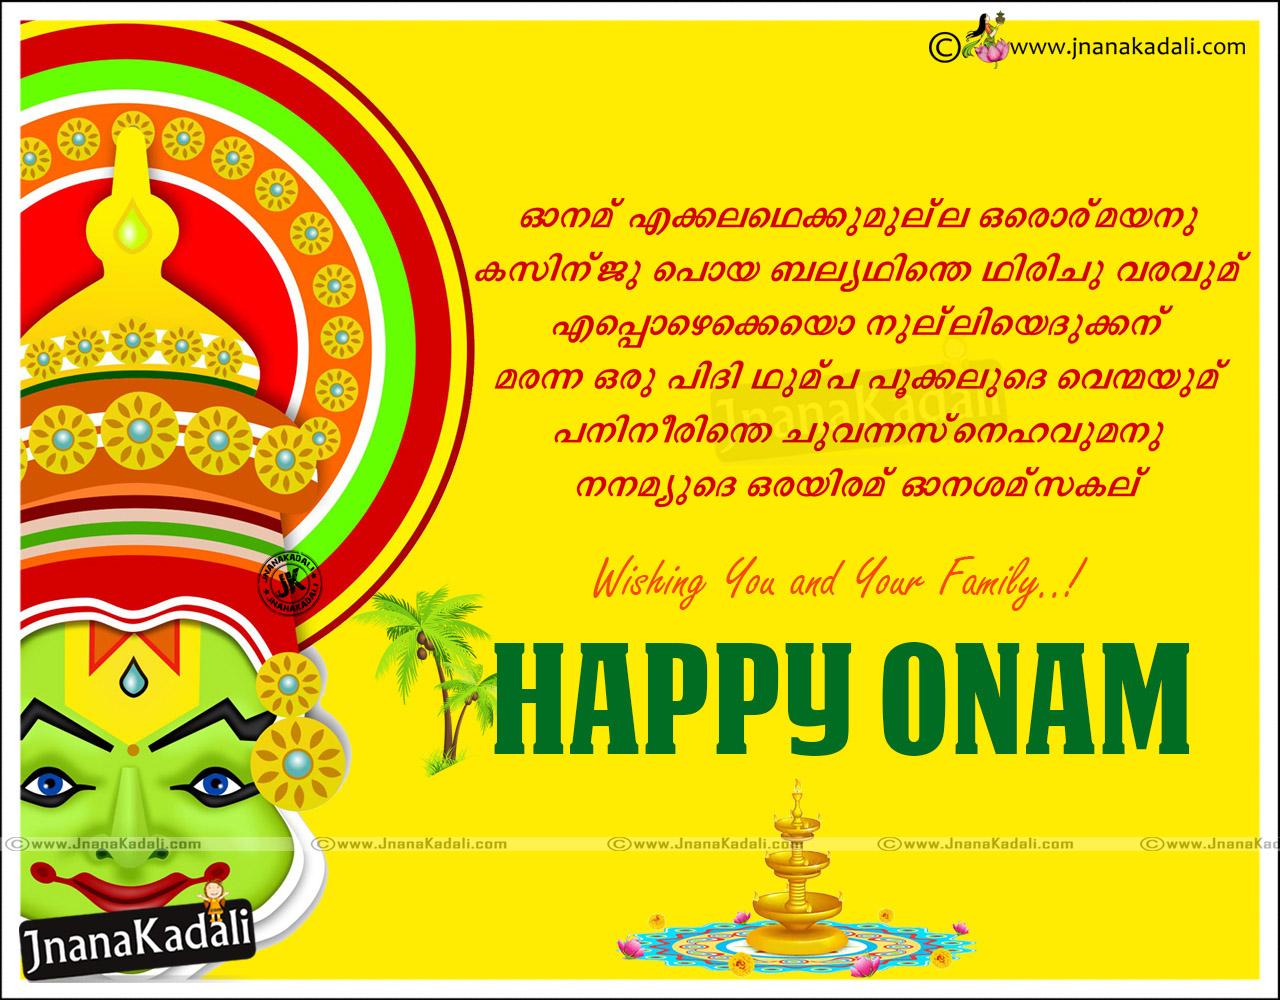 Happy Onam Wishes Hd Wallpapers Labzada Wallpaper